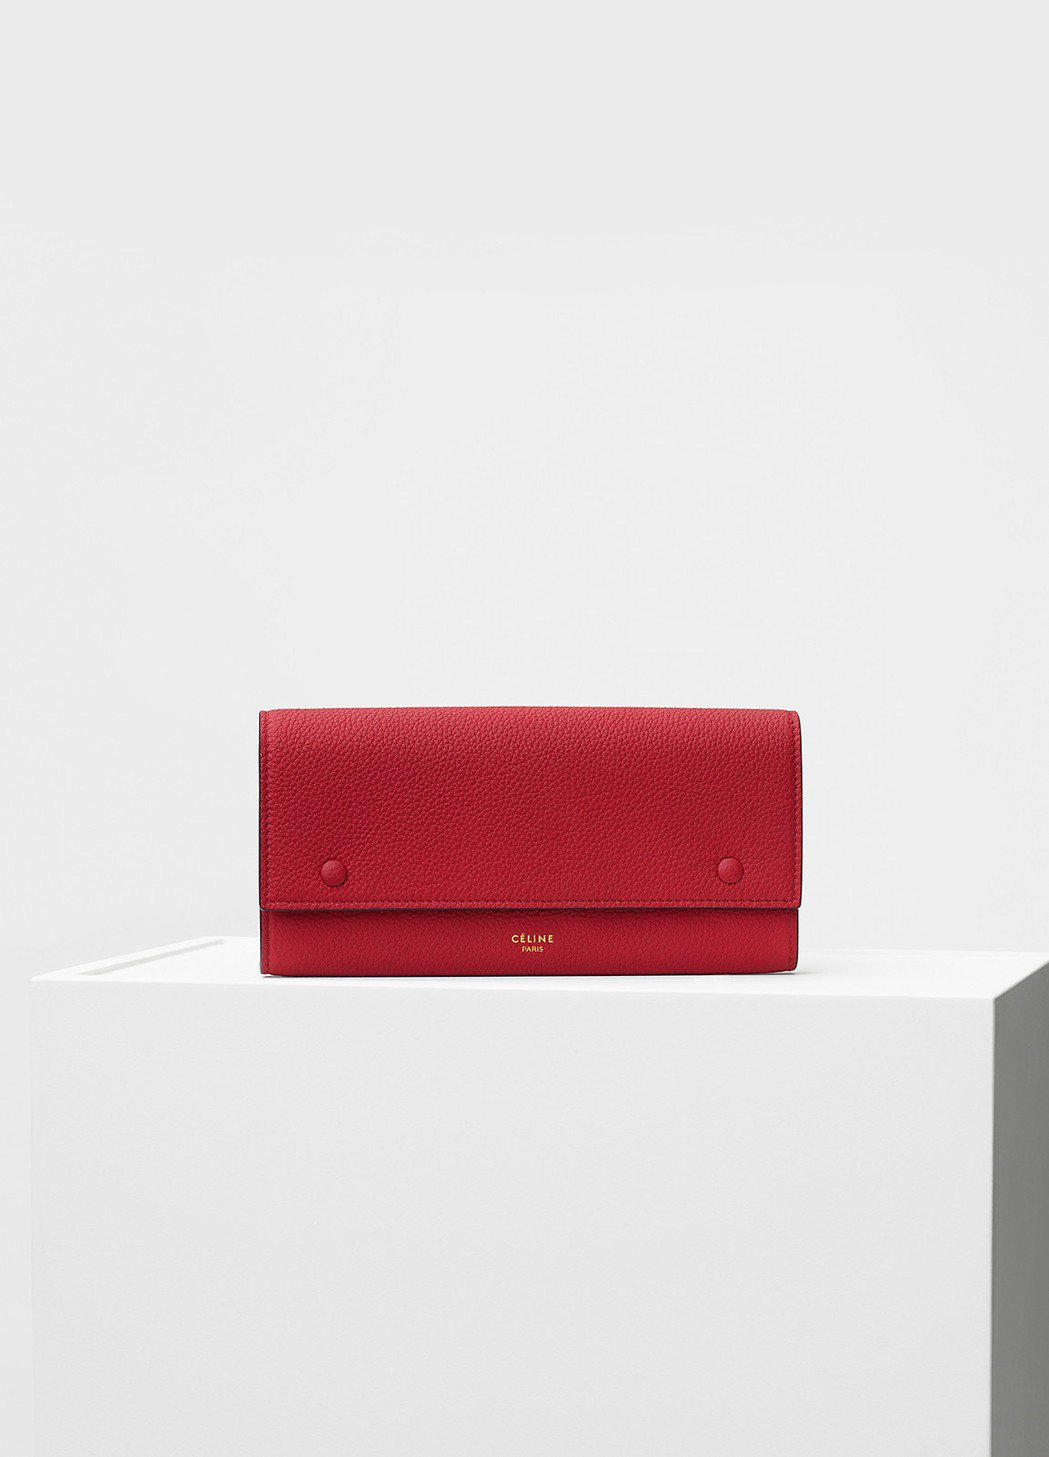 Drummed正紅色小牛皮長夾,售價23,000元。圖/CÉLINE提供